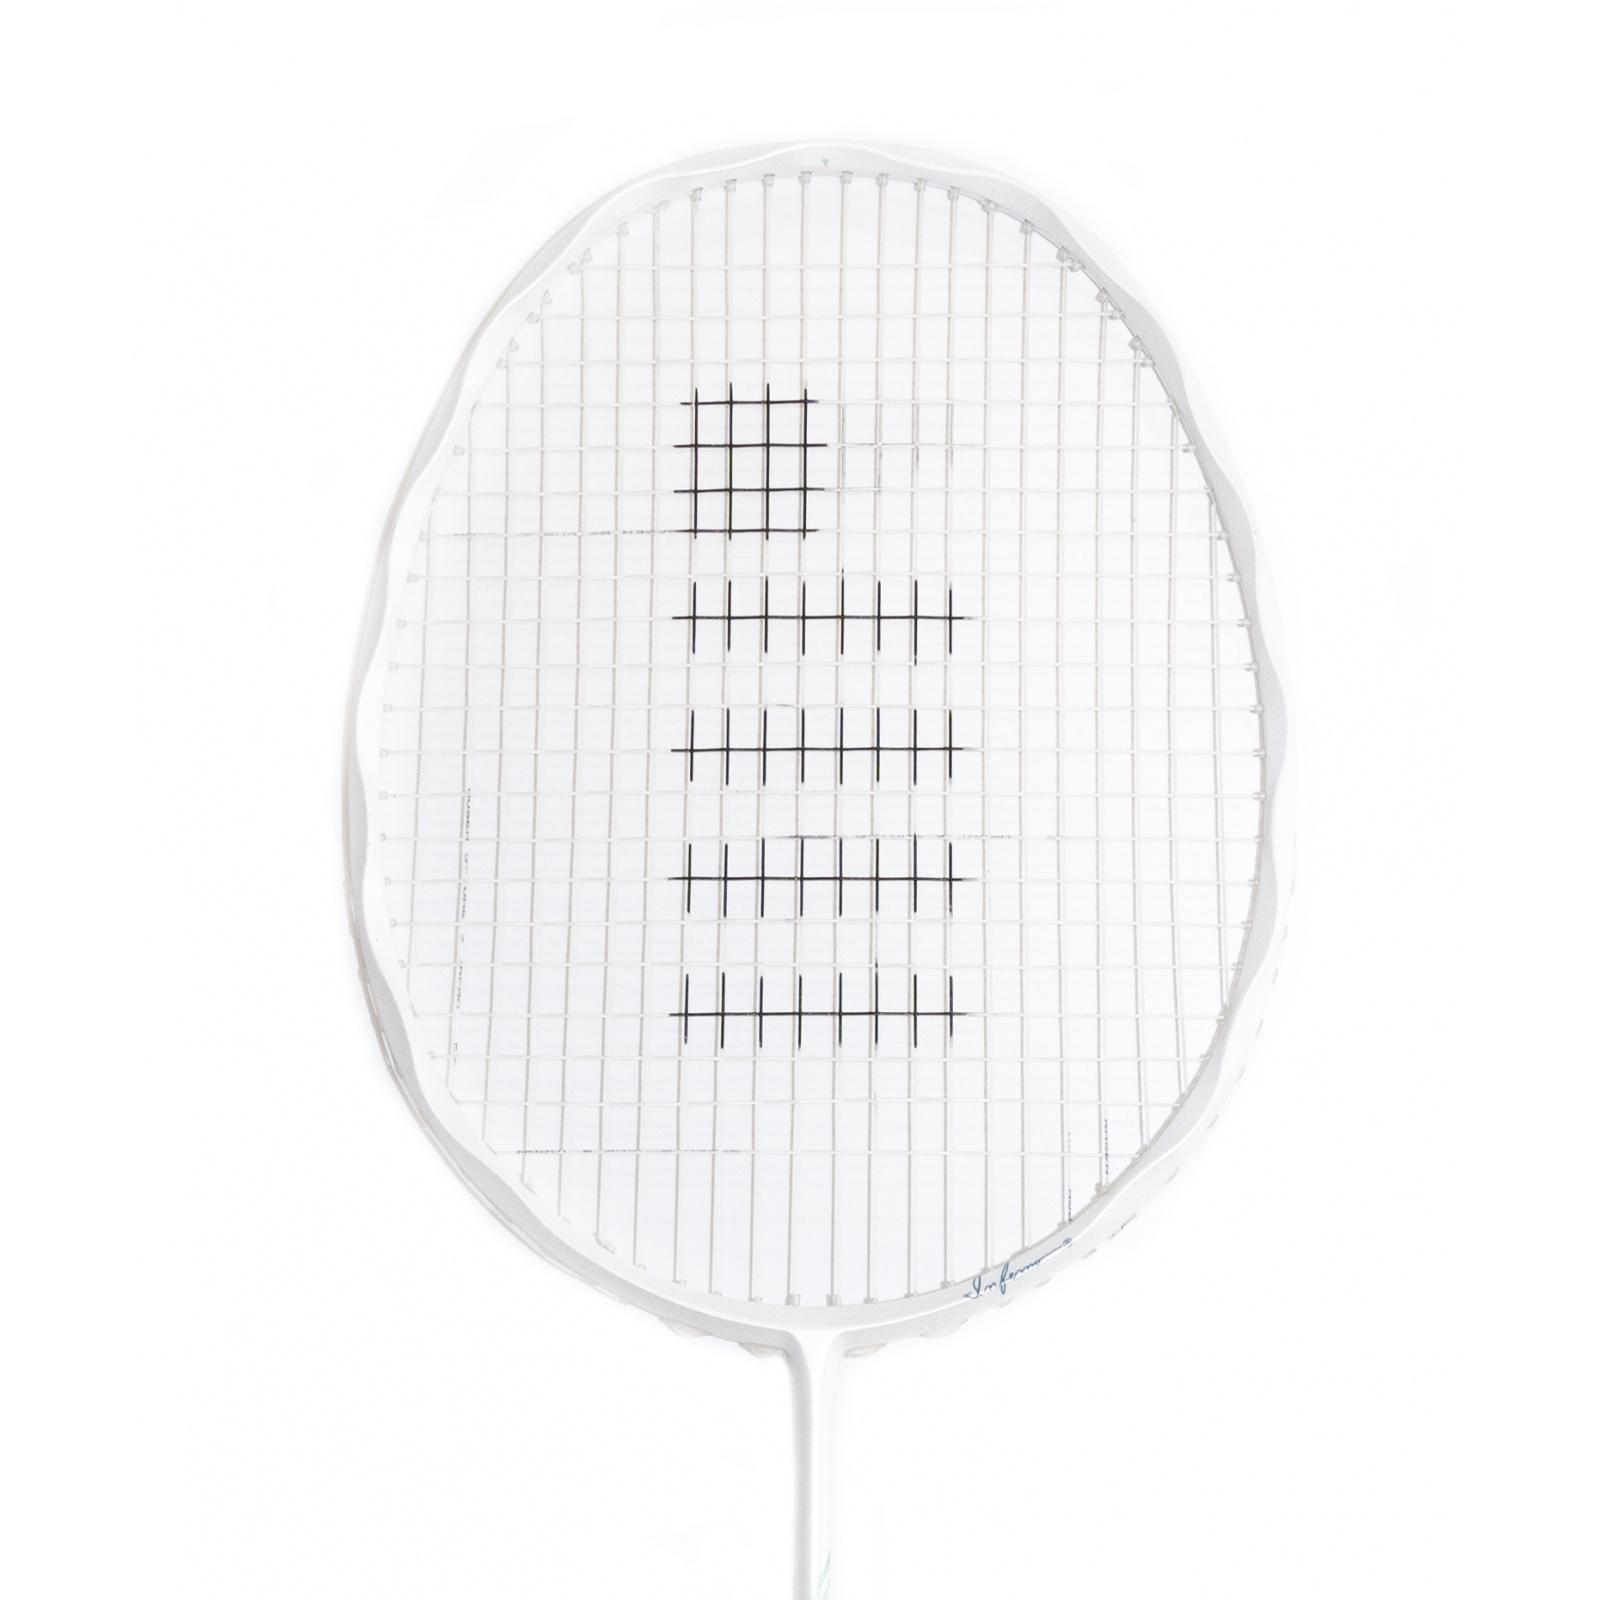 https://www.badec.store/produkty_img/badmintonova-raketa1585391818L.jpg